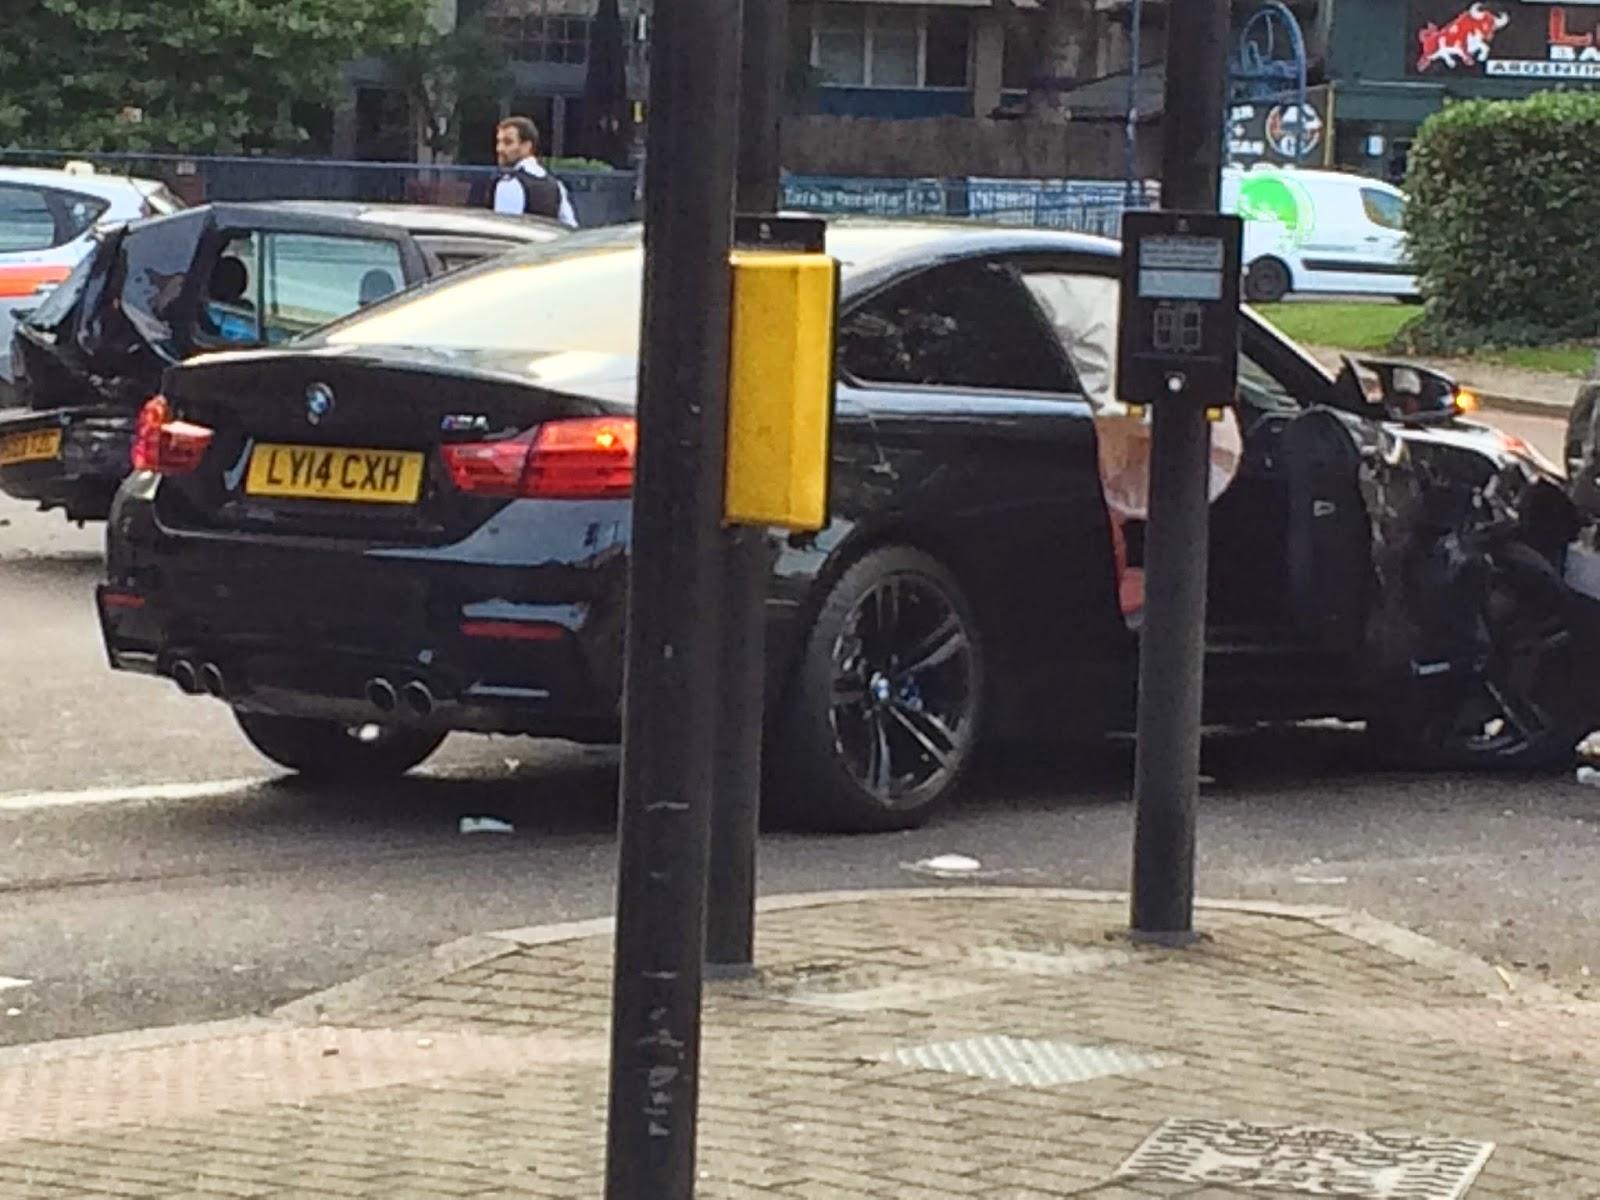 Black BMW M4 Coupe Crashes in London - GTspirit